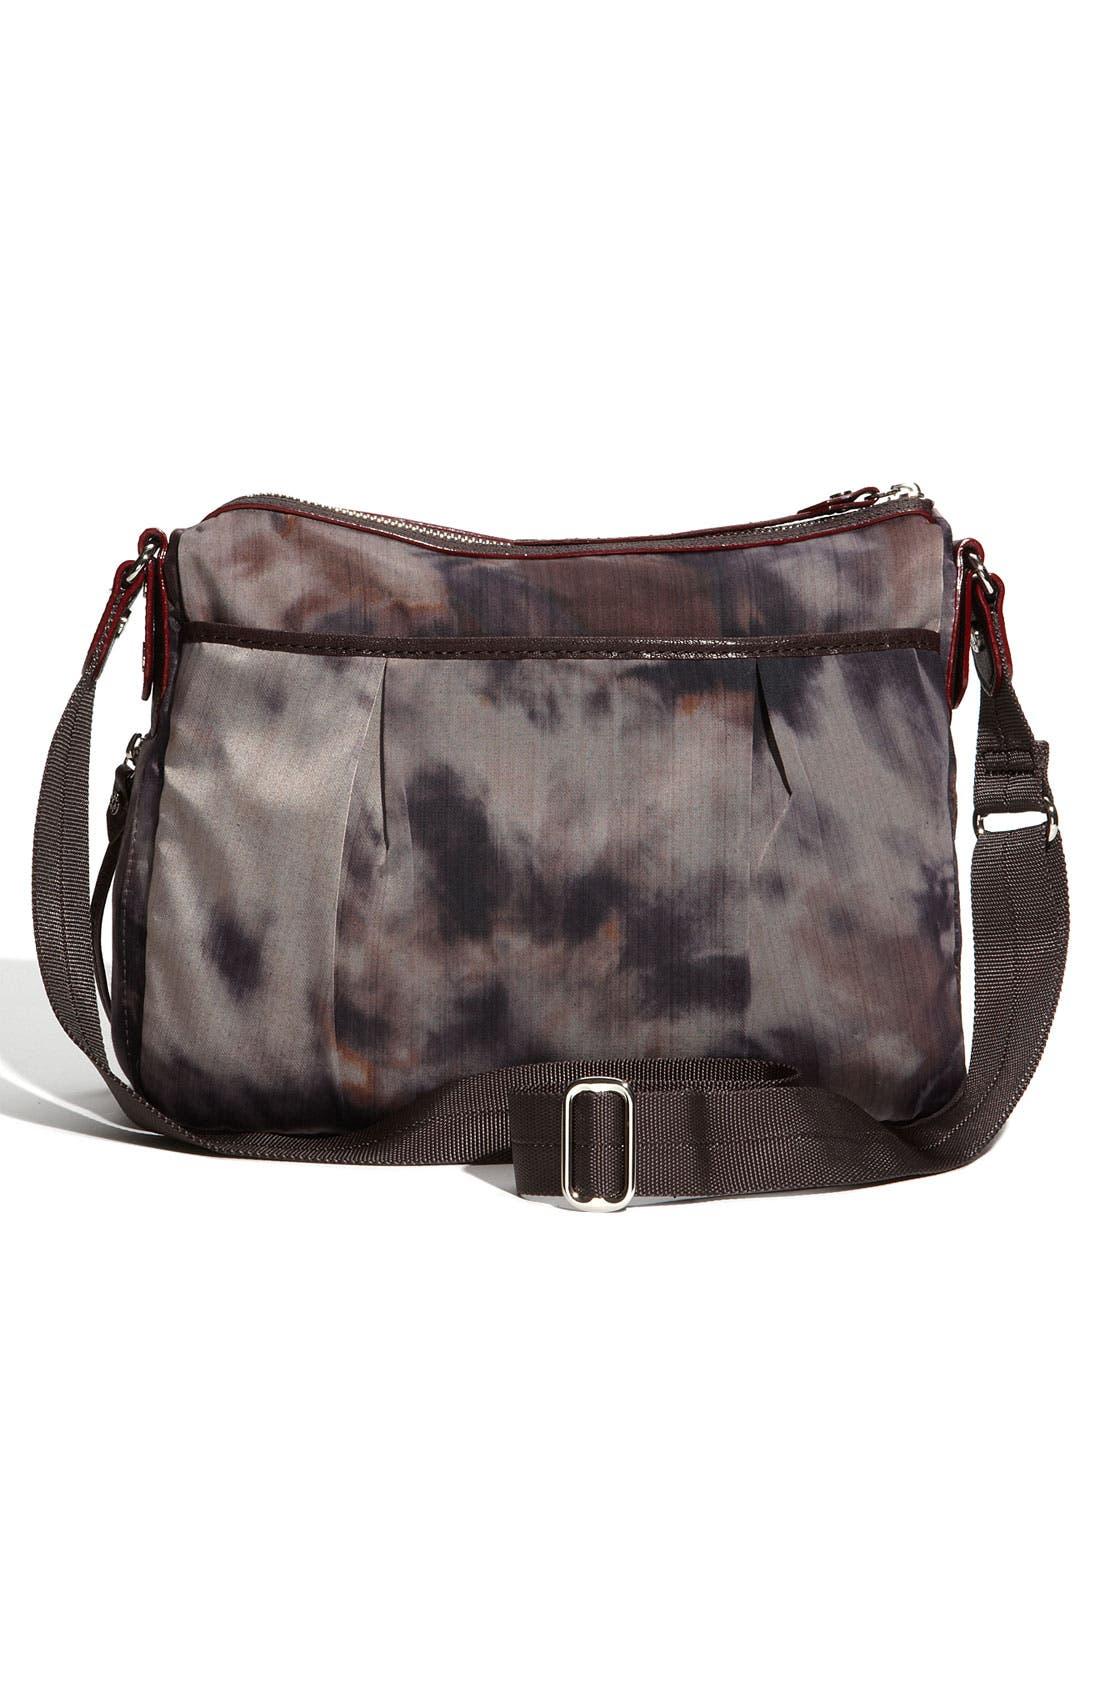 'Paige - Night Storm' Crossbody Bag,                             Alternate thumbnail 4, color,                             500